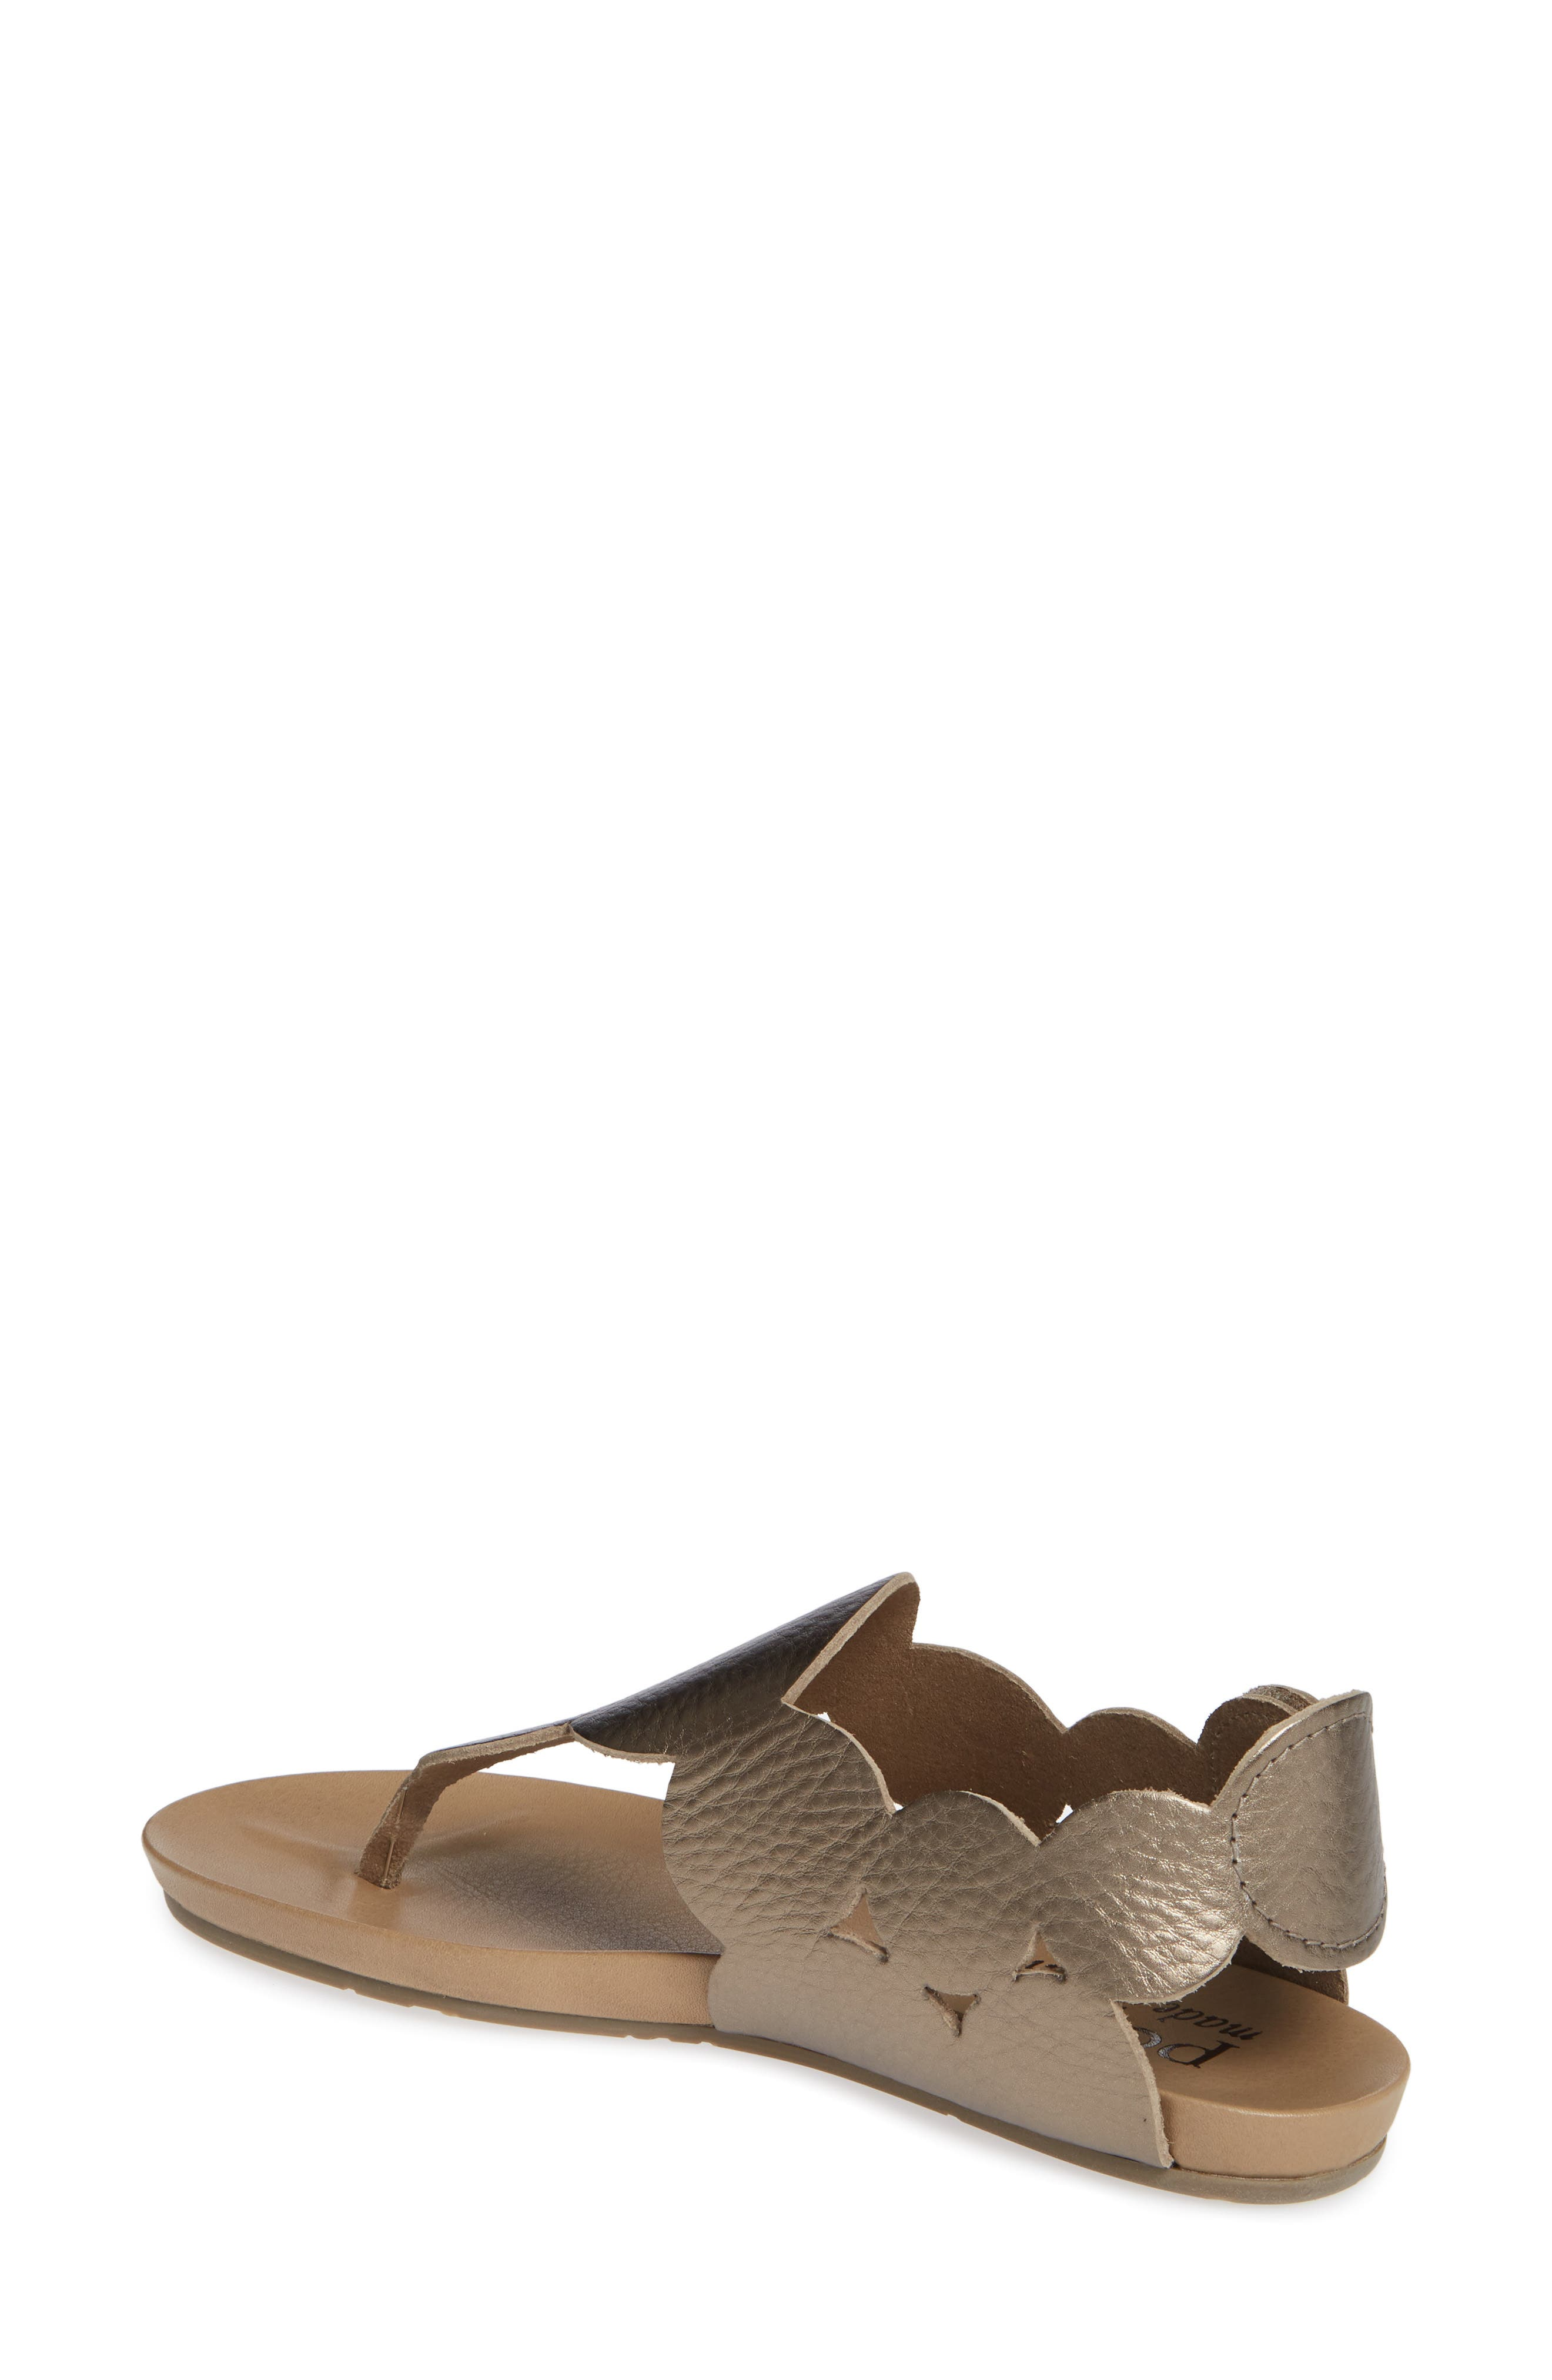 Pedro Garcia Womens Shoes Nordstrom Tendencies Sandals Footbed 2 Strap Brown 42